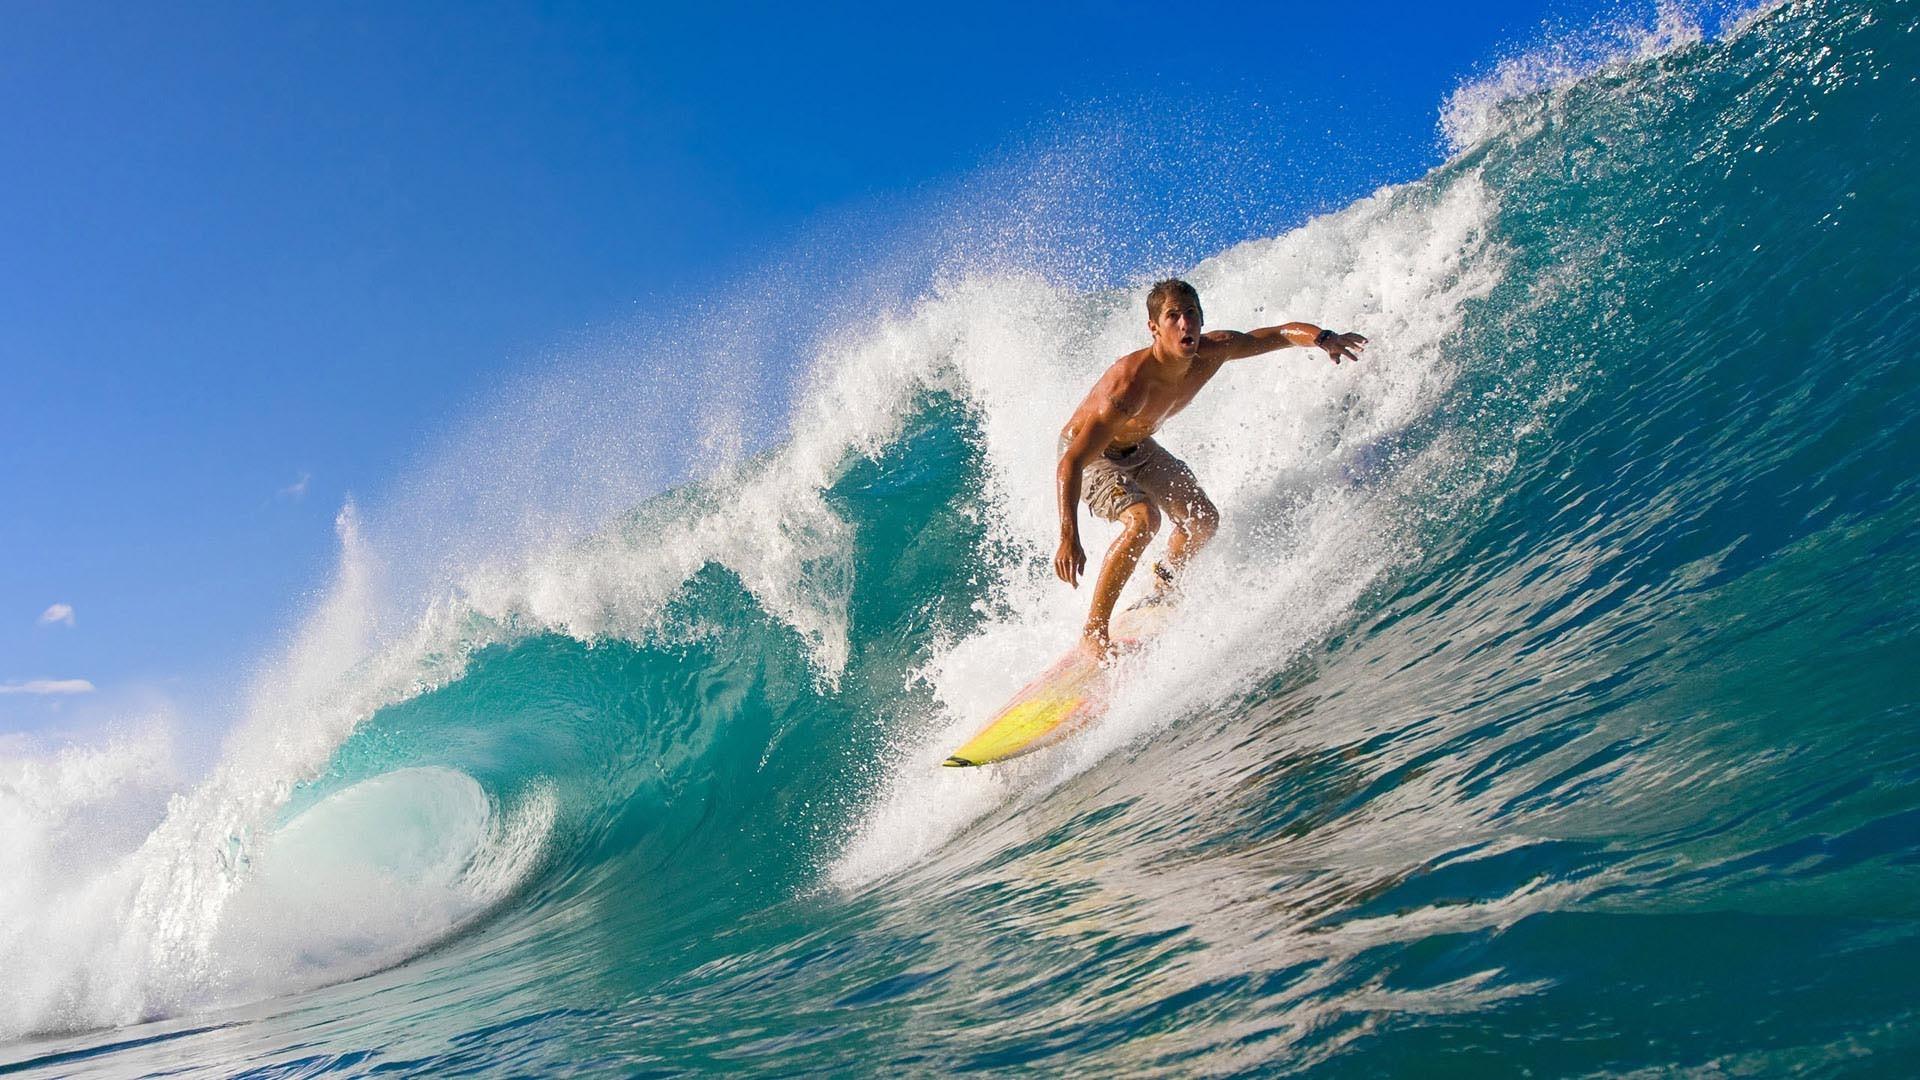 Surfing Wave HD Wallpaper. « »